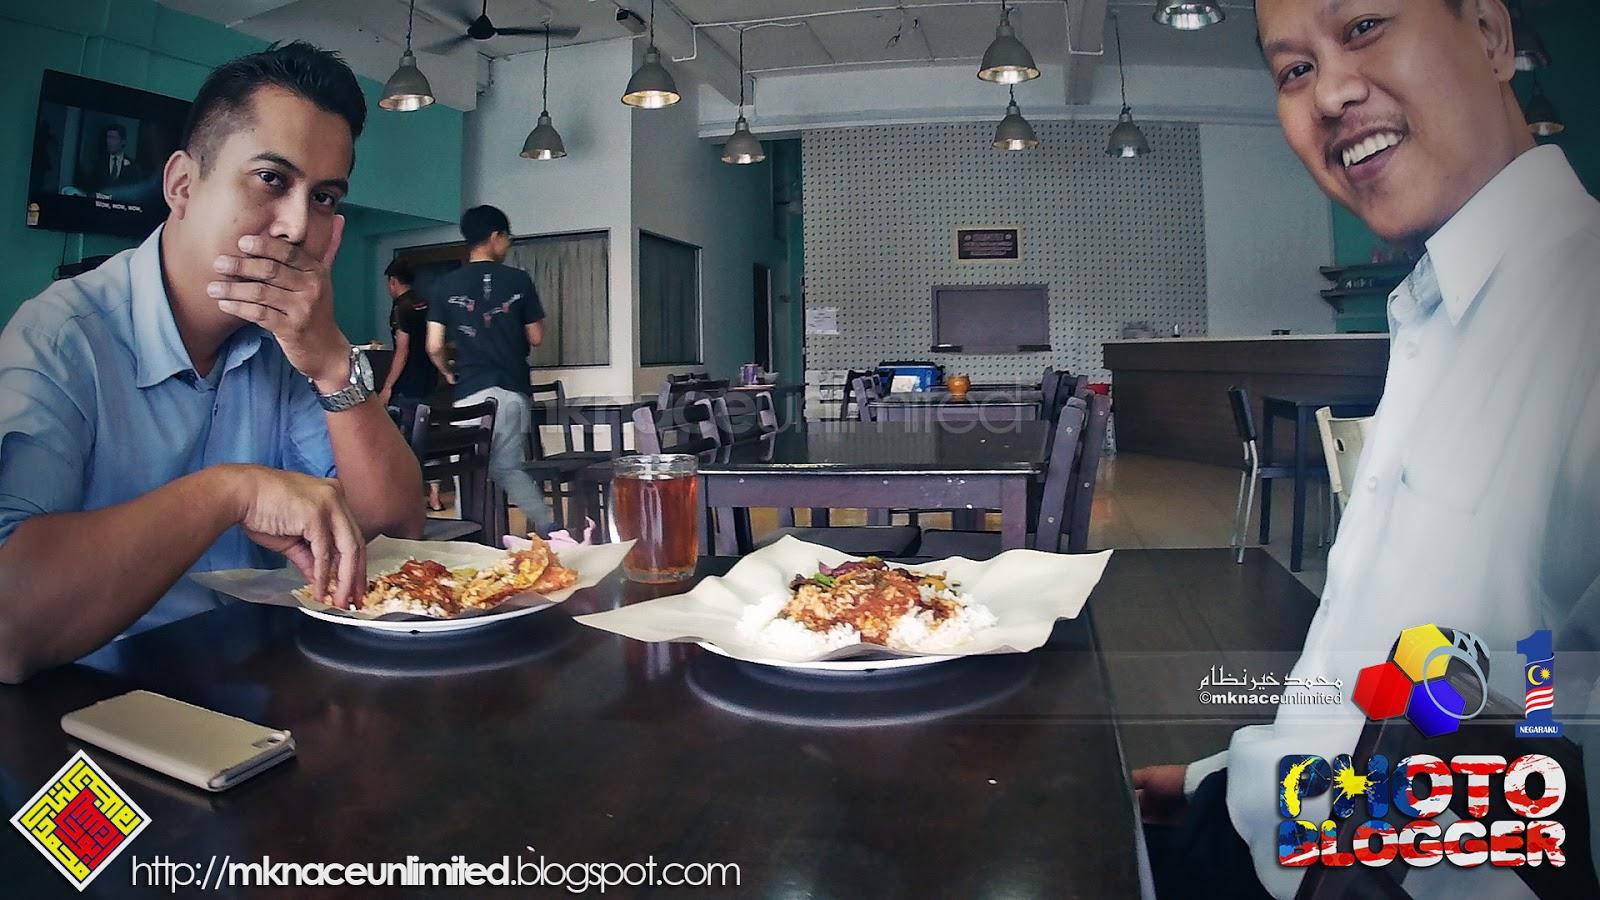 Kedai makan upin ipin bhg $15 000 sweepstakes